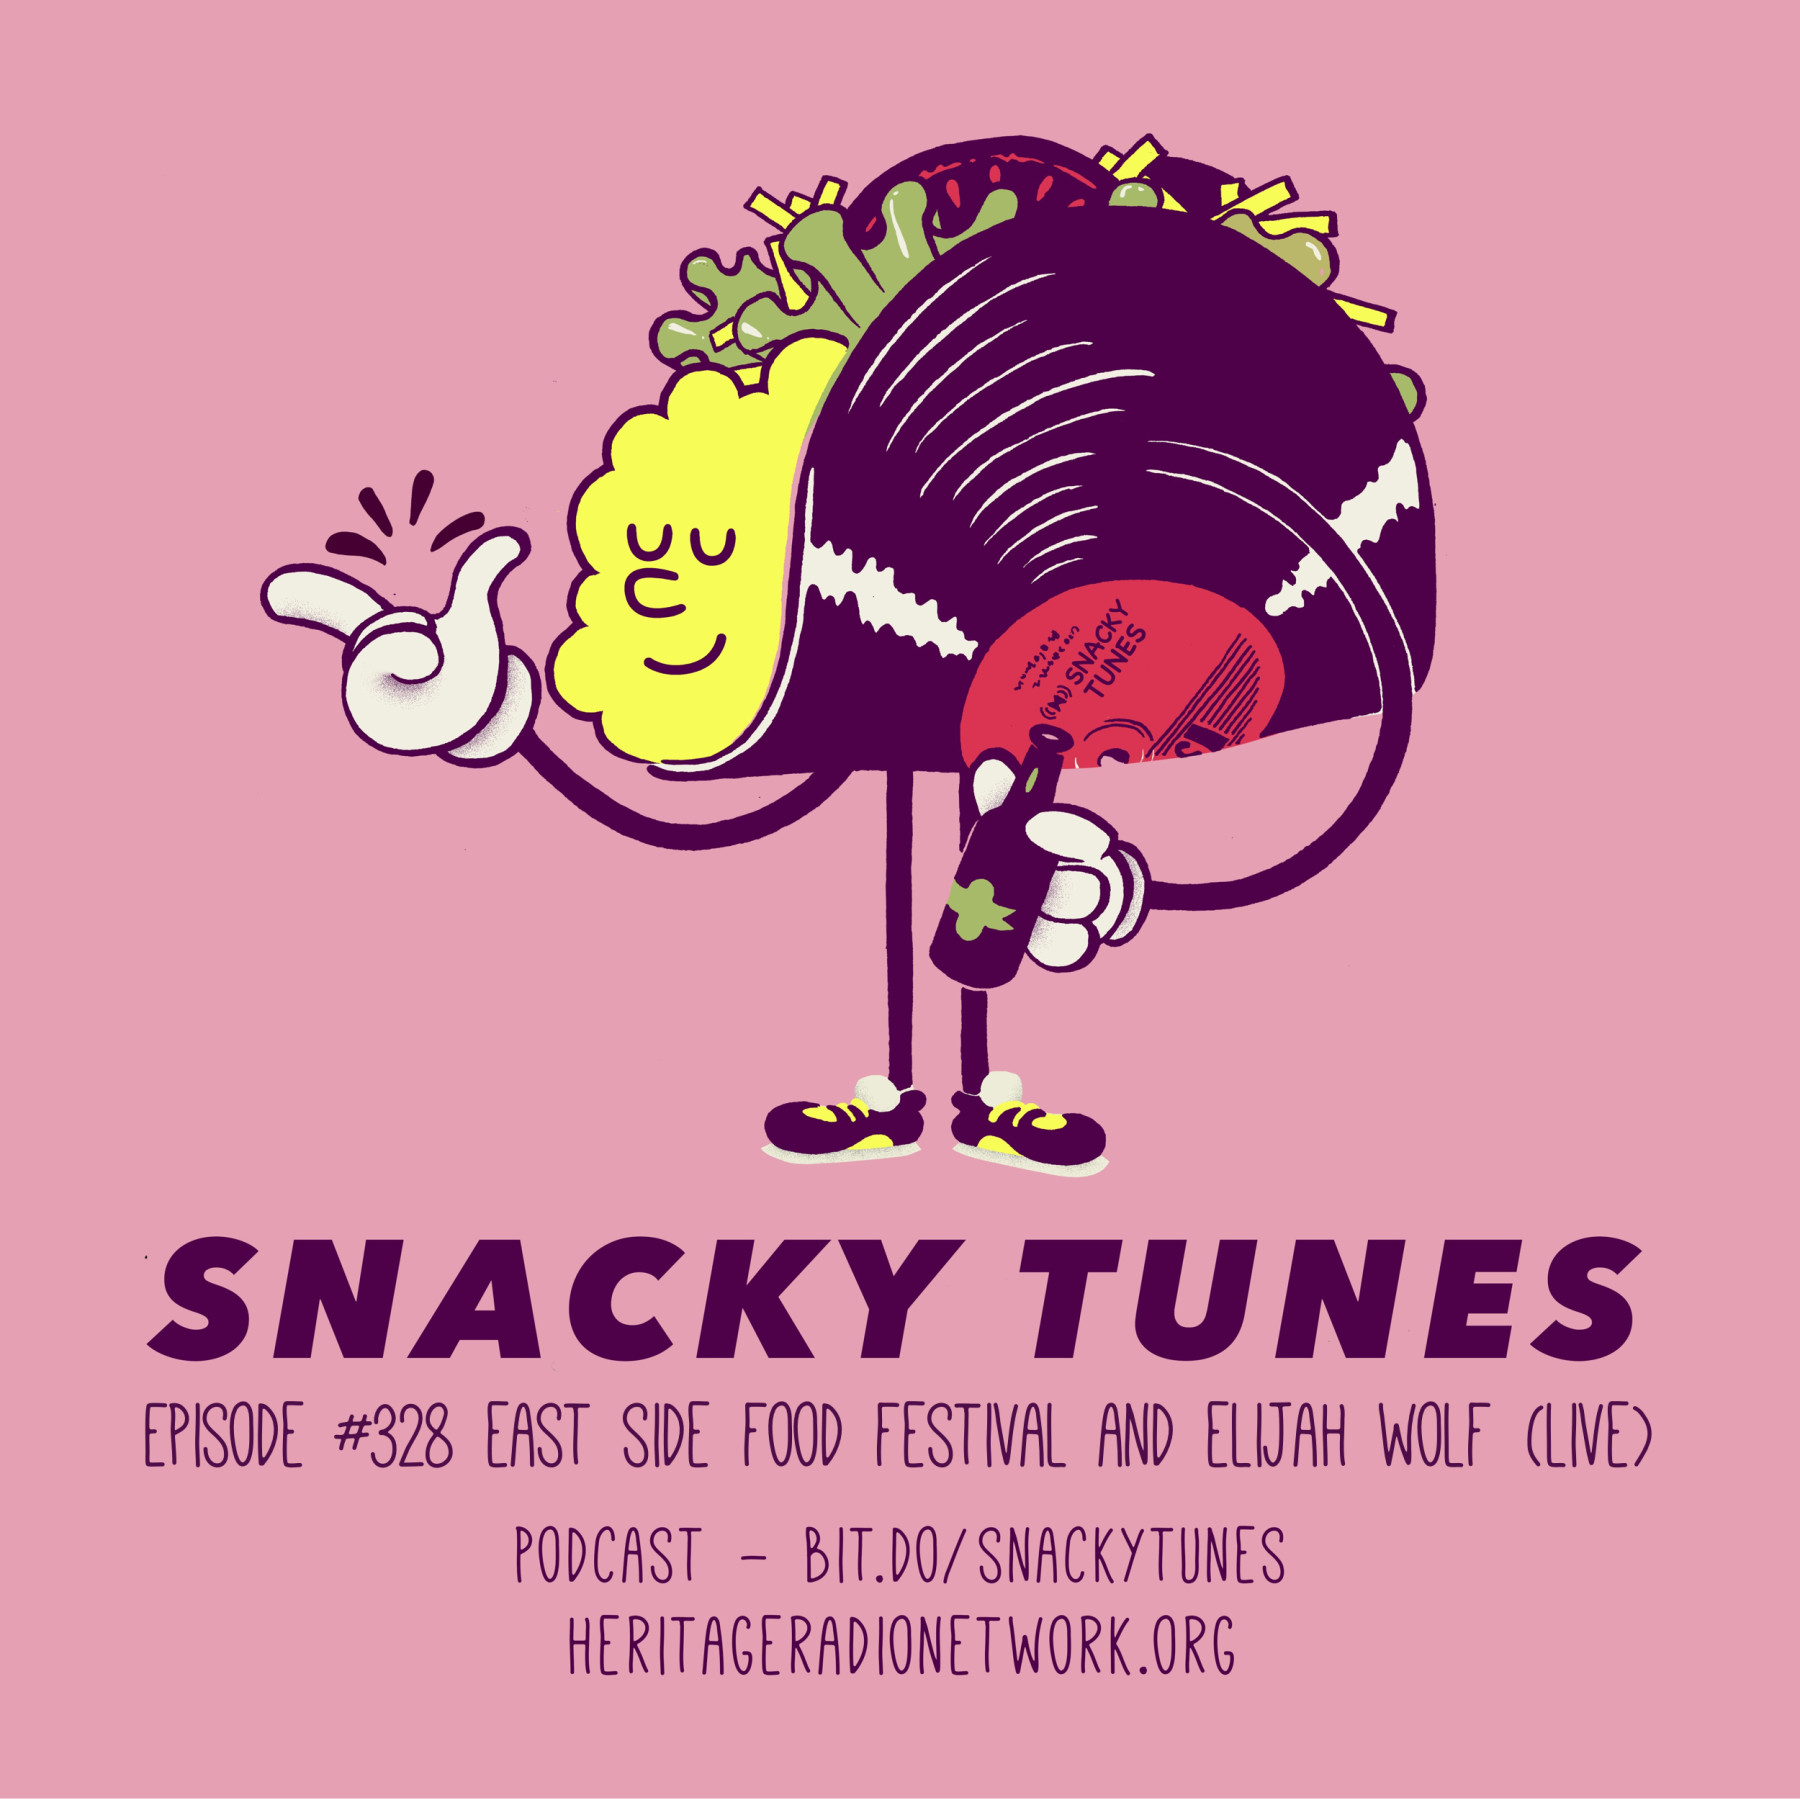 Snacky_Tunes-Podacst_Editable_328.001